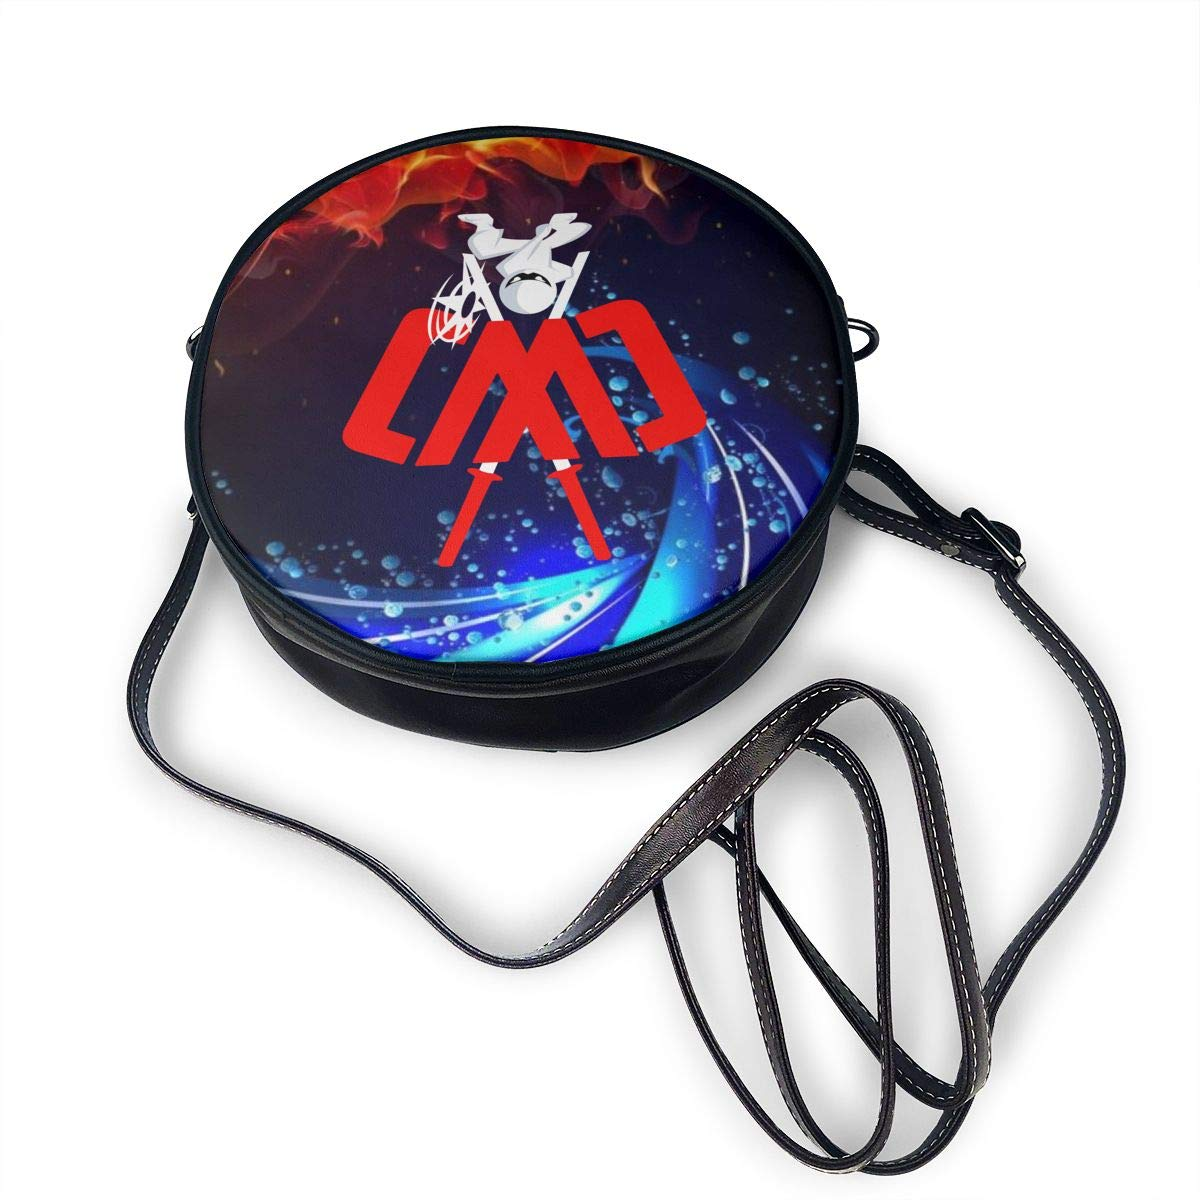 ATRXZ Cwc Chad Wild Clay Ninja logotyp merch crossbody axel butiksväskor för tonåringar kvinnor 6